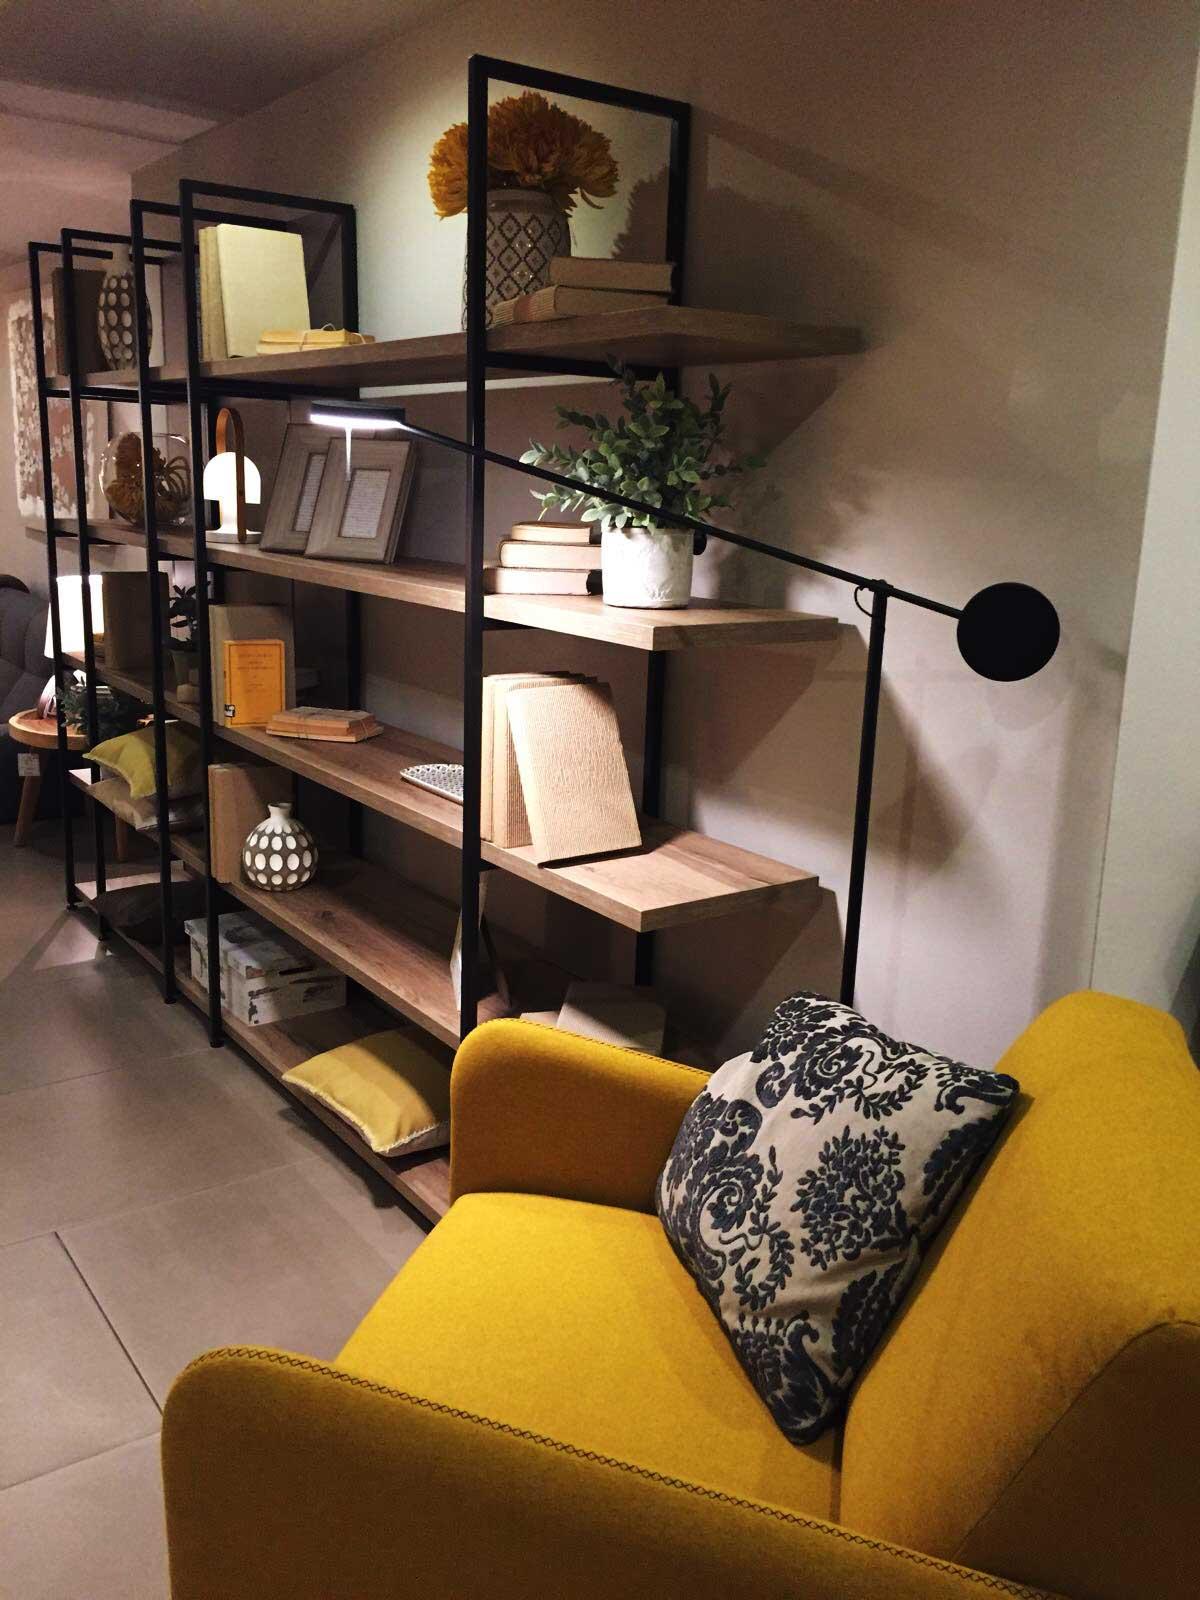 Tiendas Muebles En La Garriga Mueble Salon Comedor La Gavarra  # Muebles Piferrer La Garriga